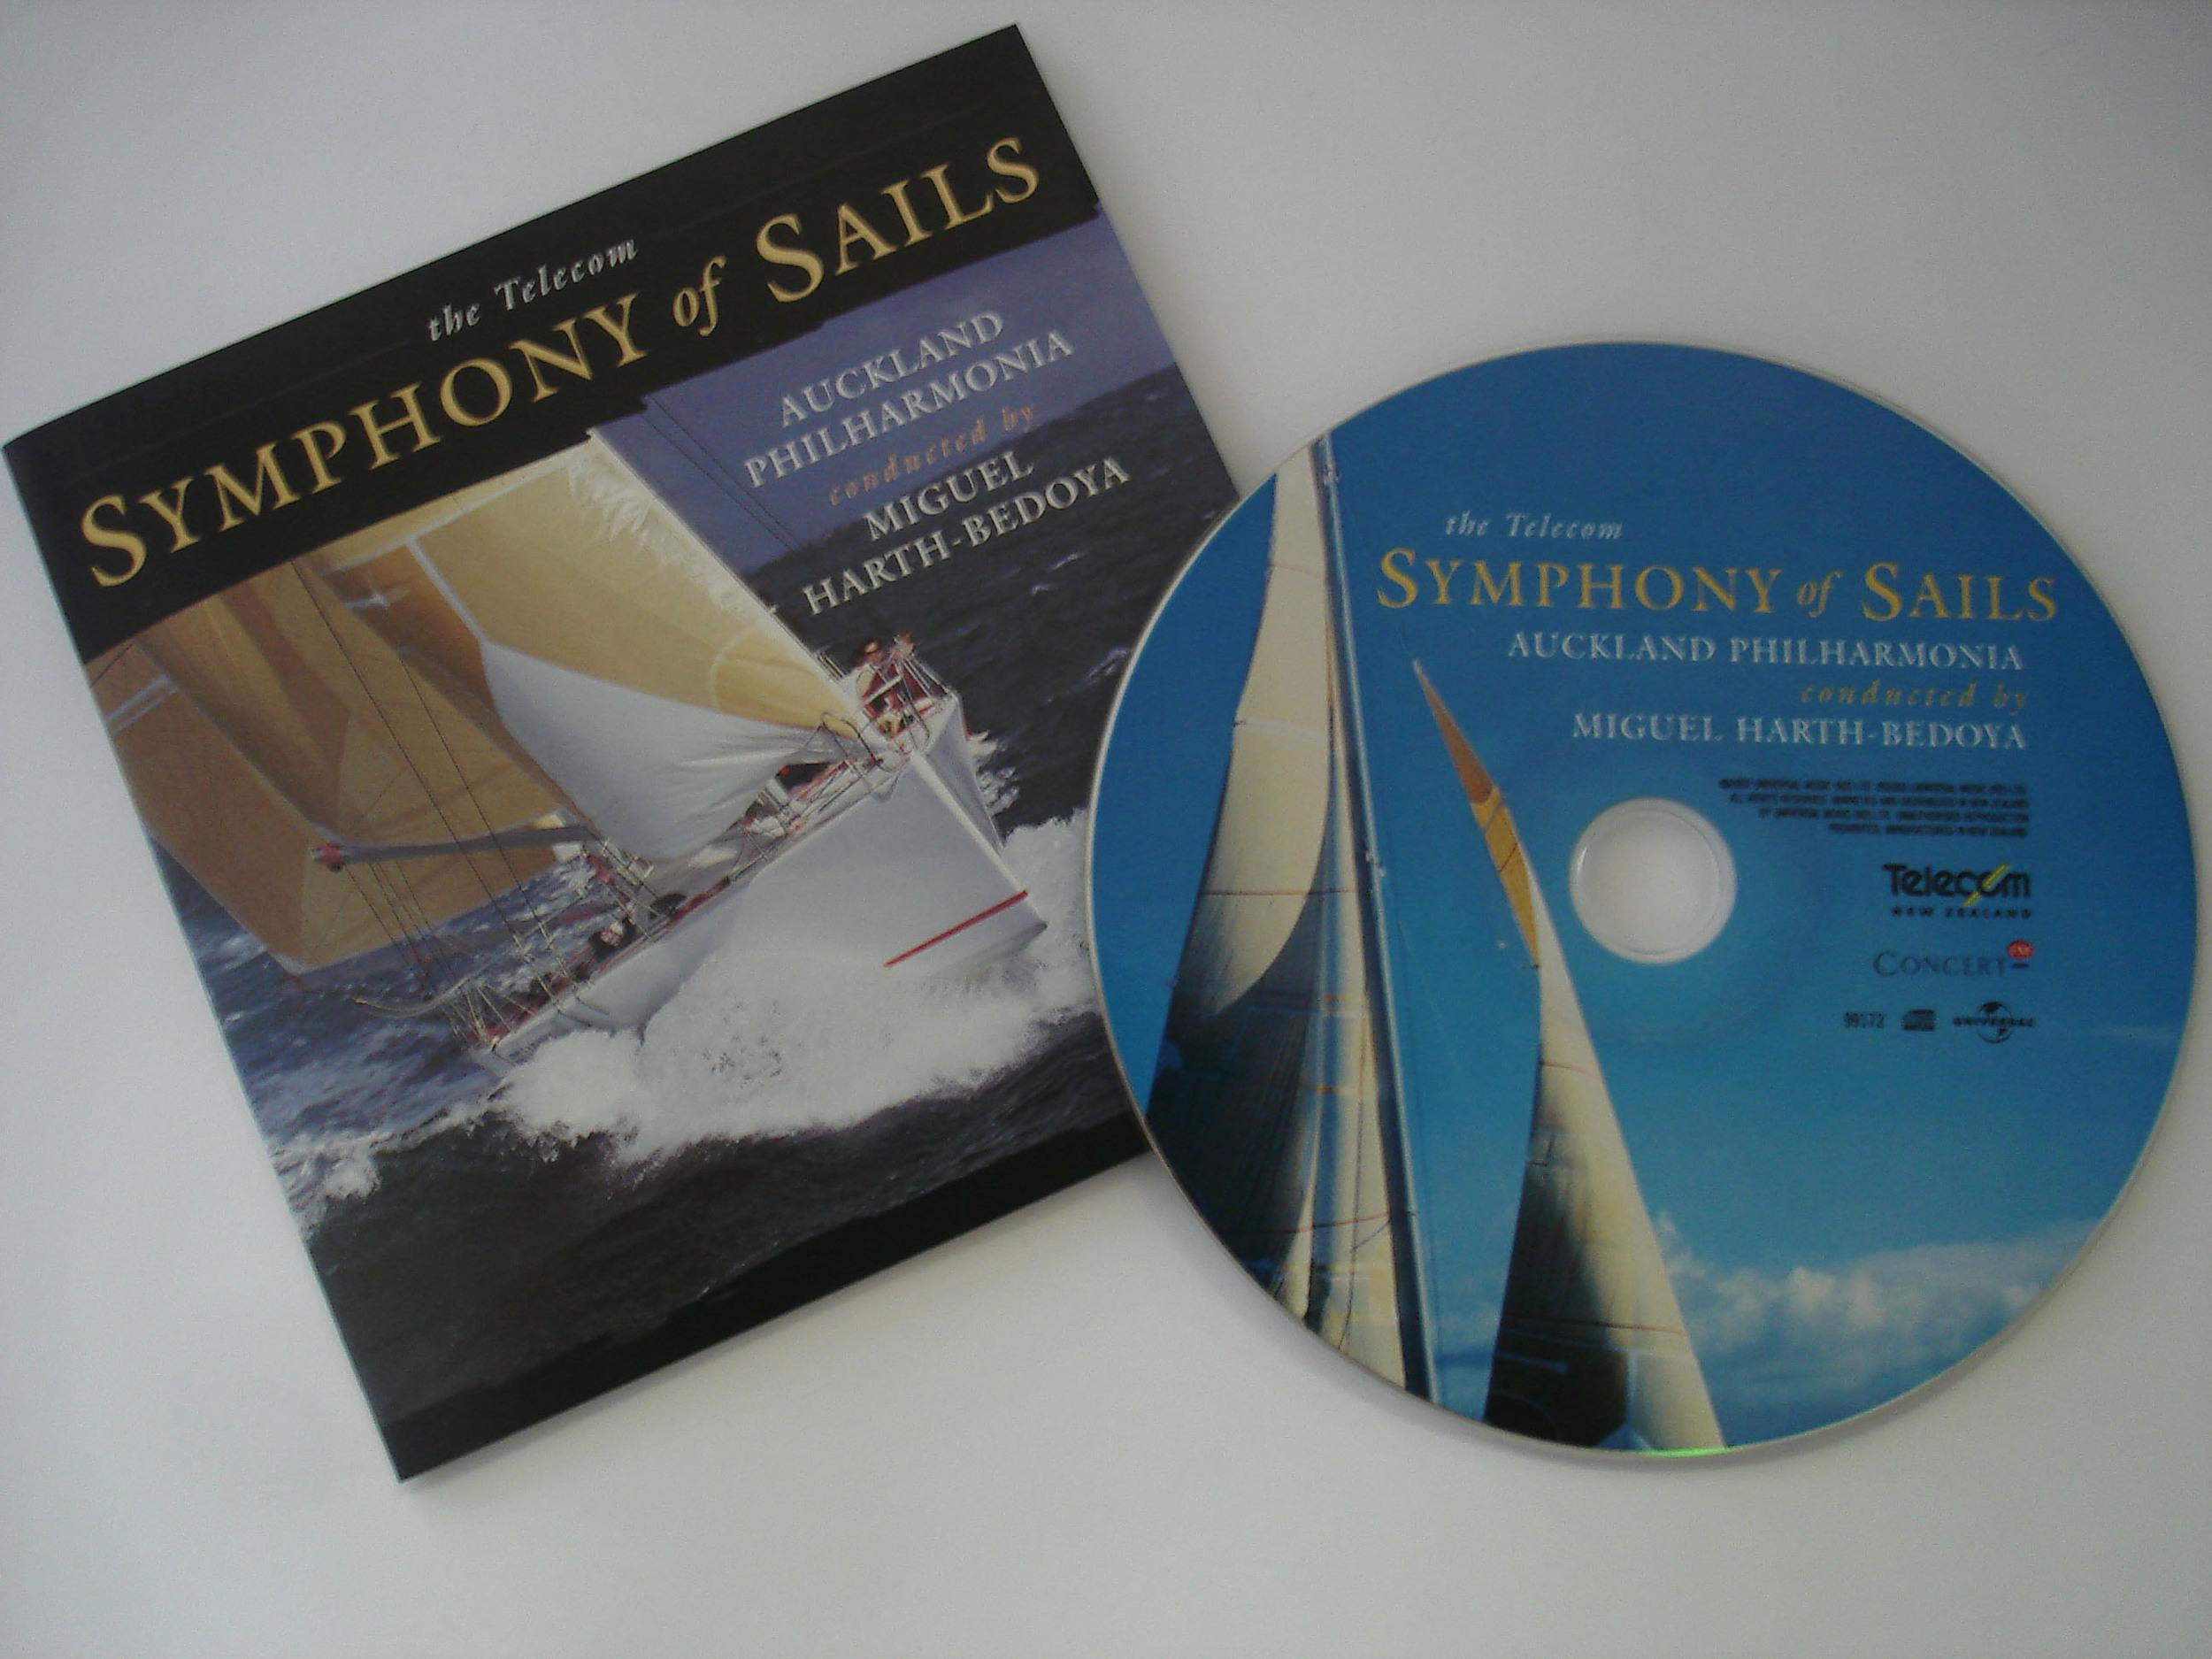 AUCKLAND PHILHARMONIA - SYMPHONY OF SAILS - ALBUM